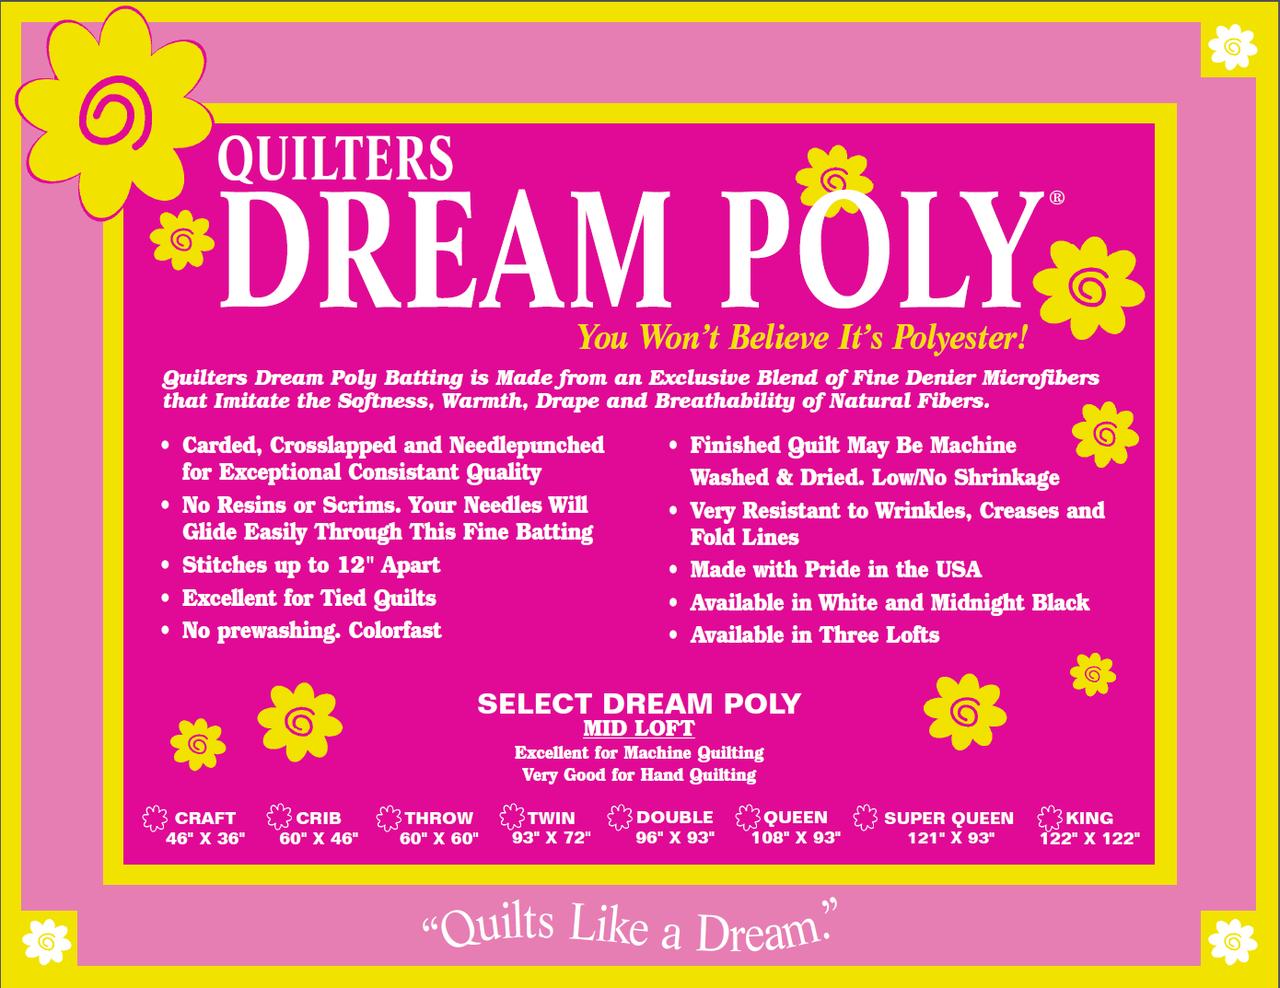 Midnight Dream Select (mid loft)/Black Poly Batting/Craft (46 x 36) (Quilters Dream)